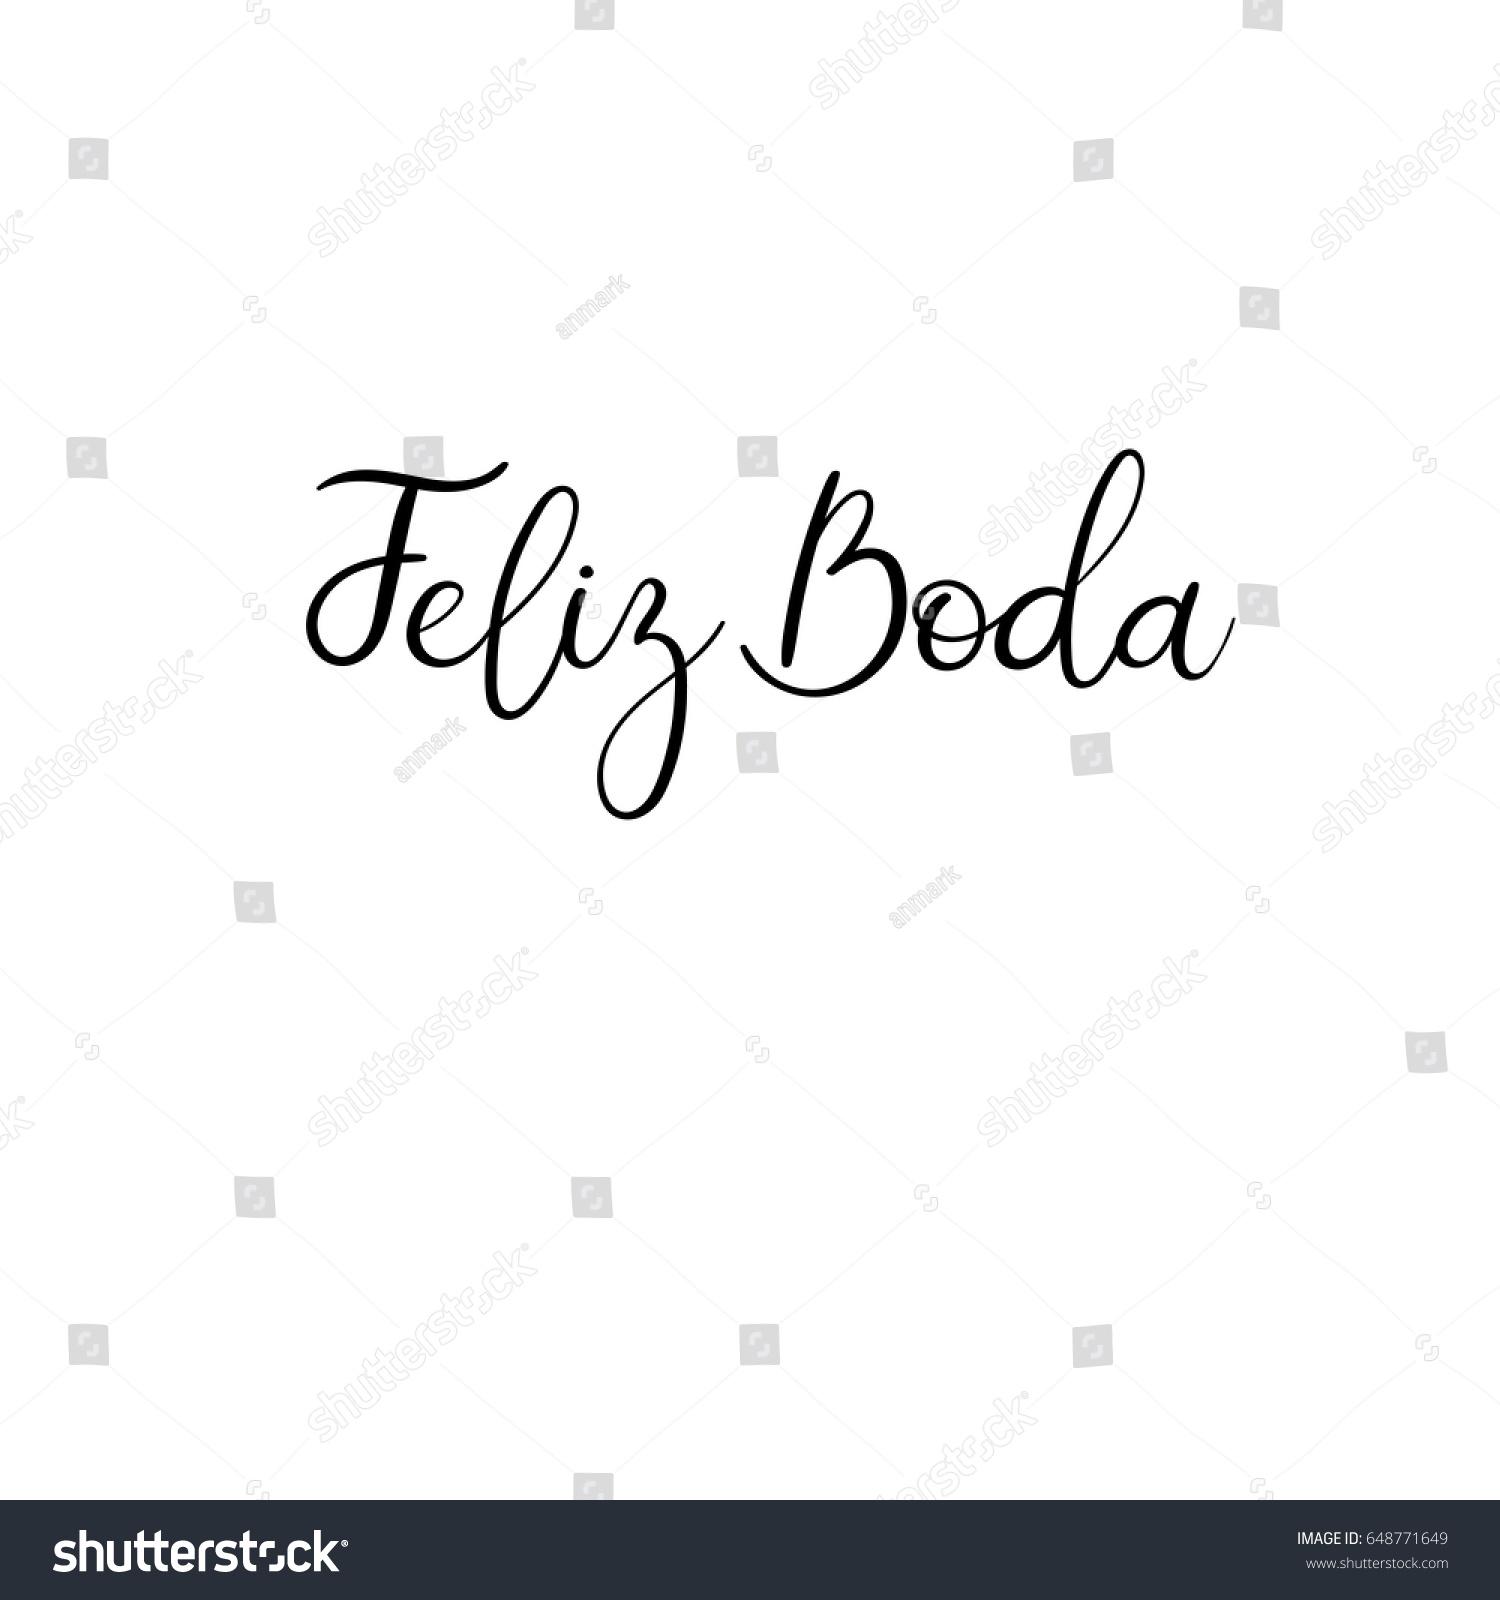 Happy wedding hand lettering text in Spanish. Feliz Boda ...